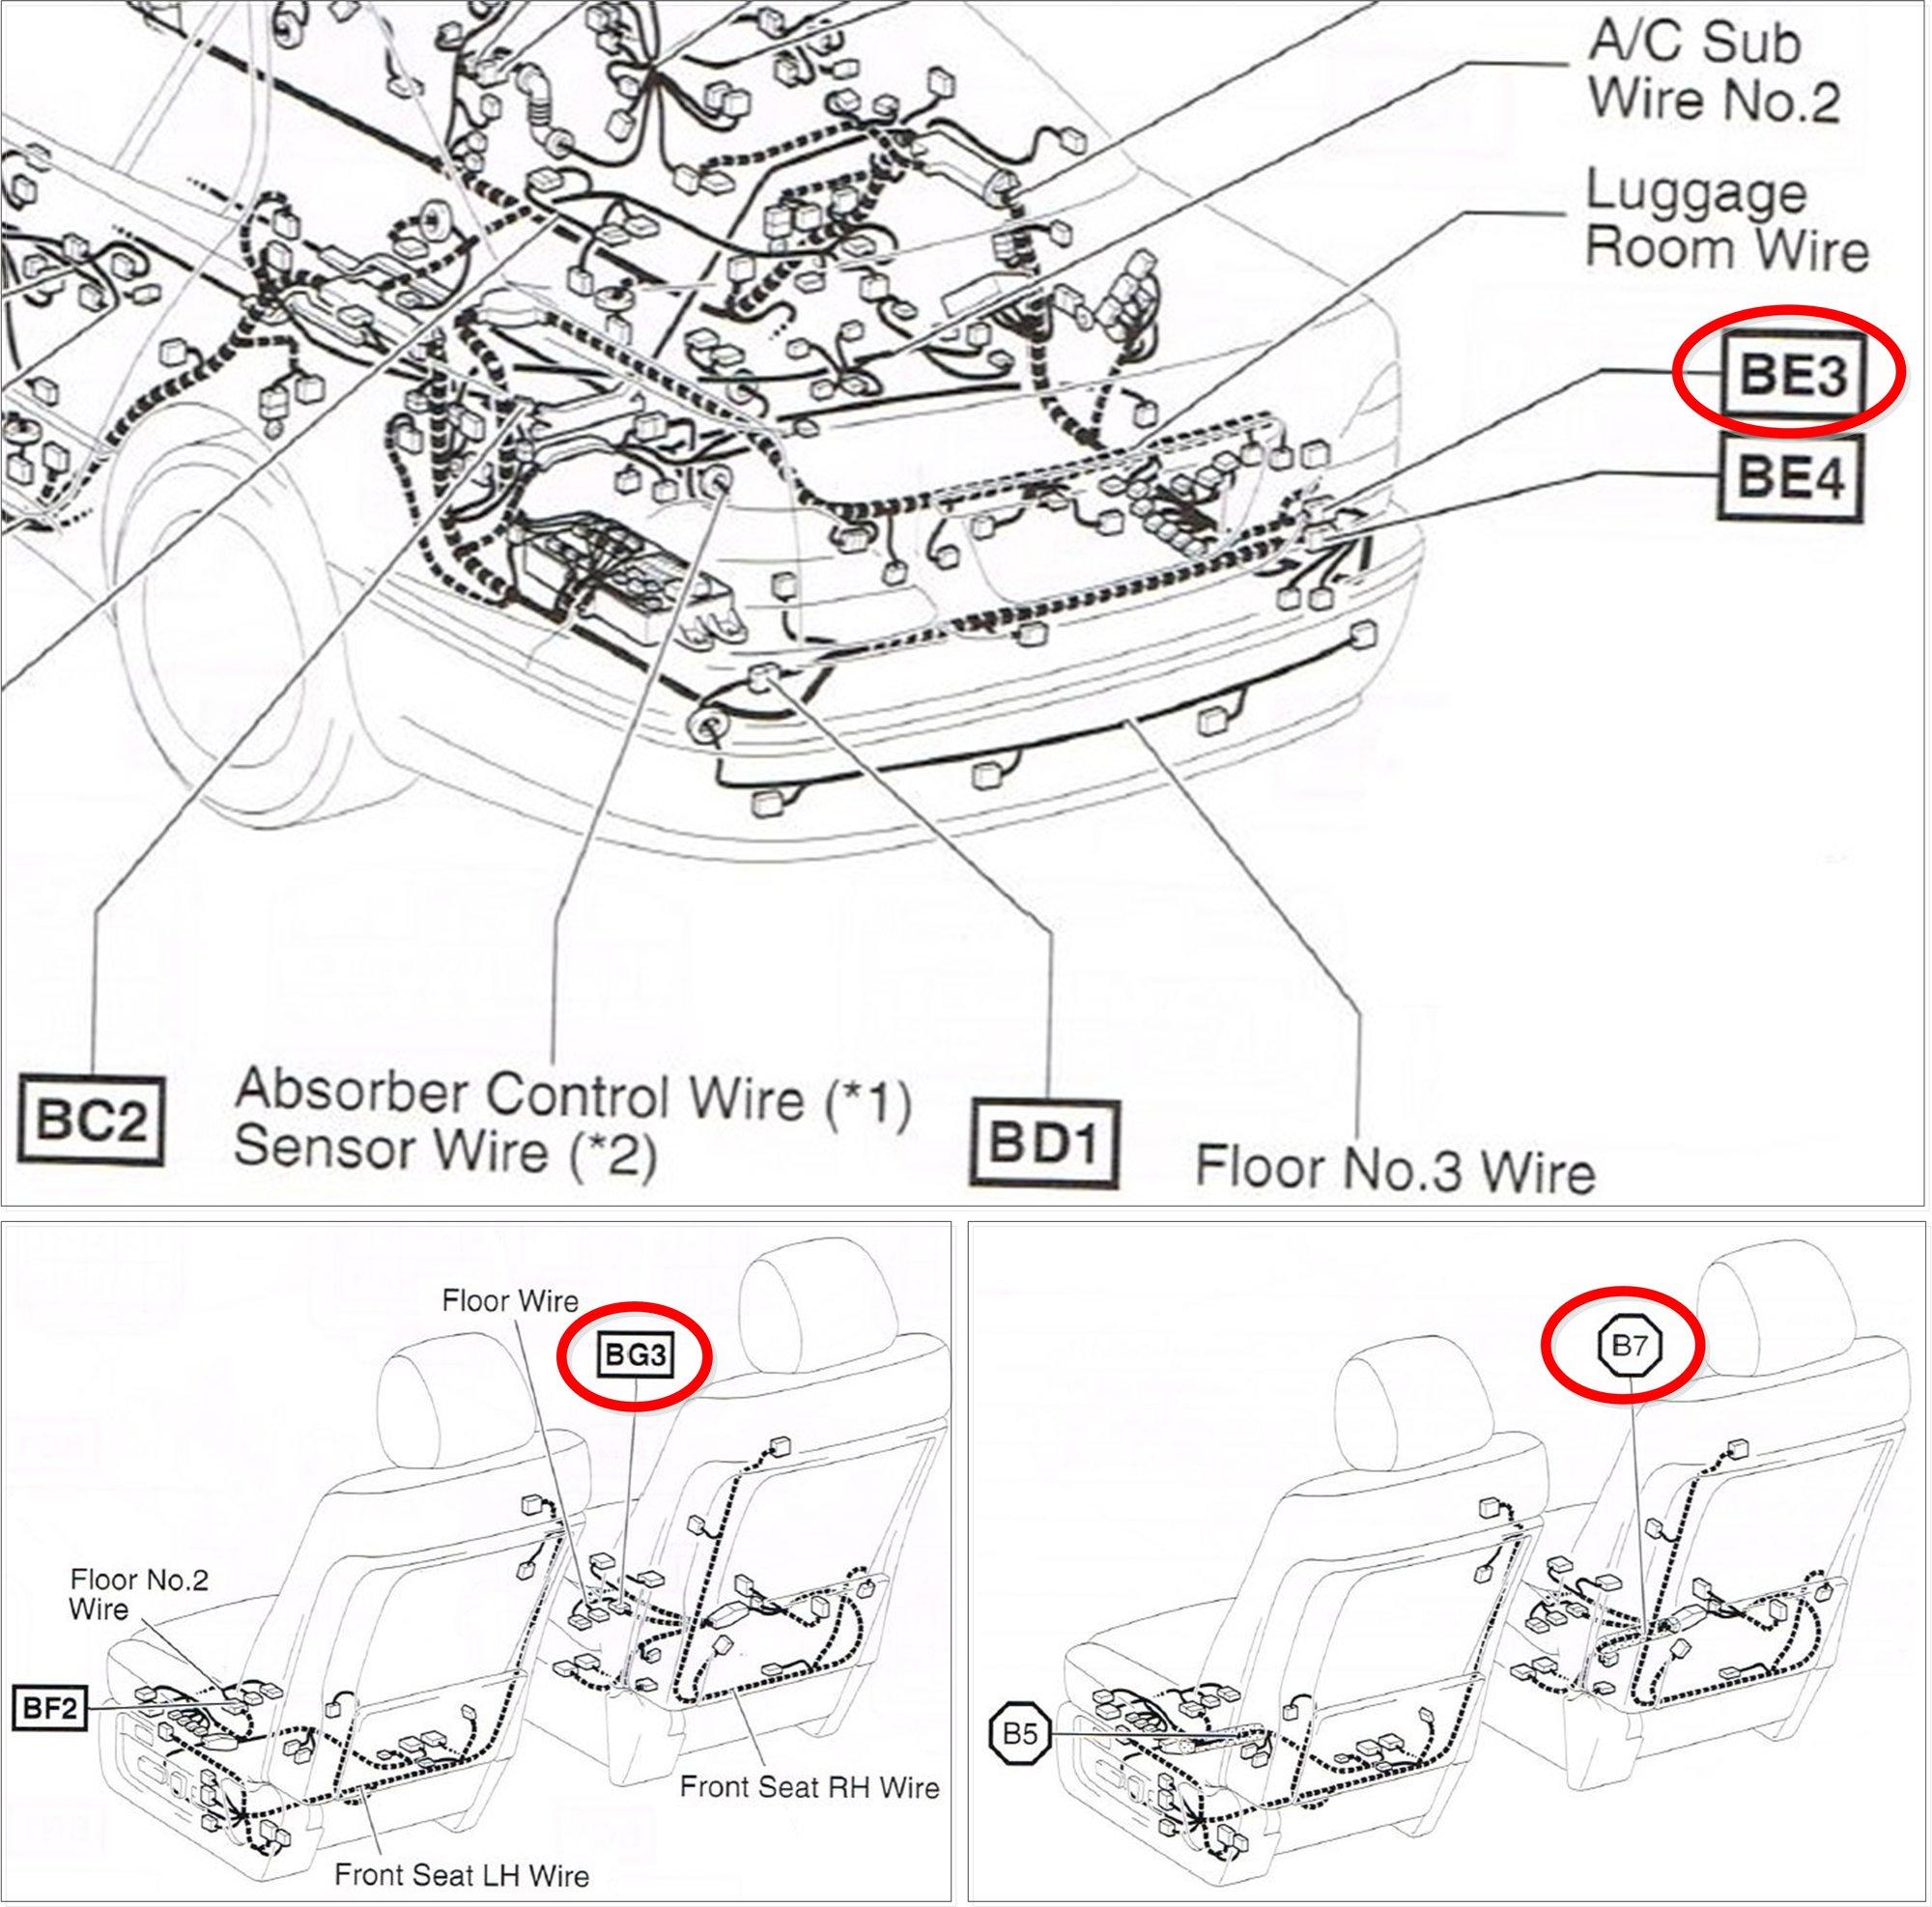 95 lexus engine diagram 1991 lexus ls400 wire diagram wiring schematic e3 wiring diagram  1991 lexus ls400 wire diagram wiring